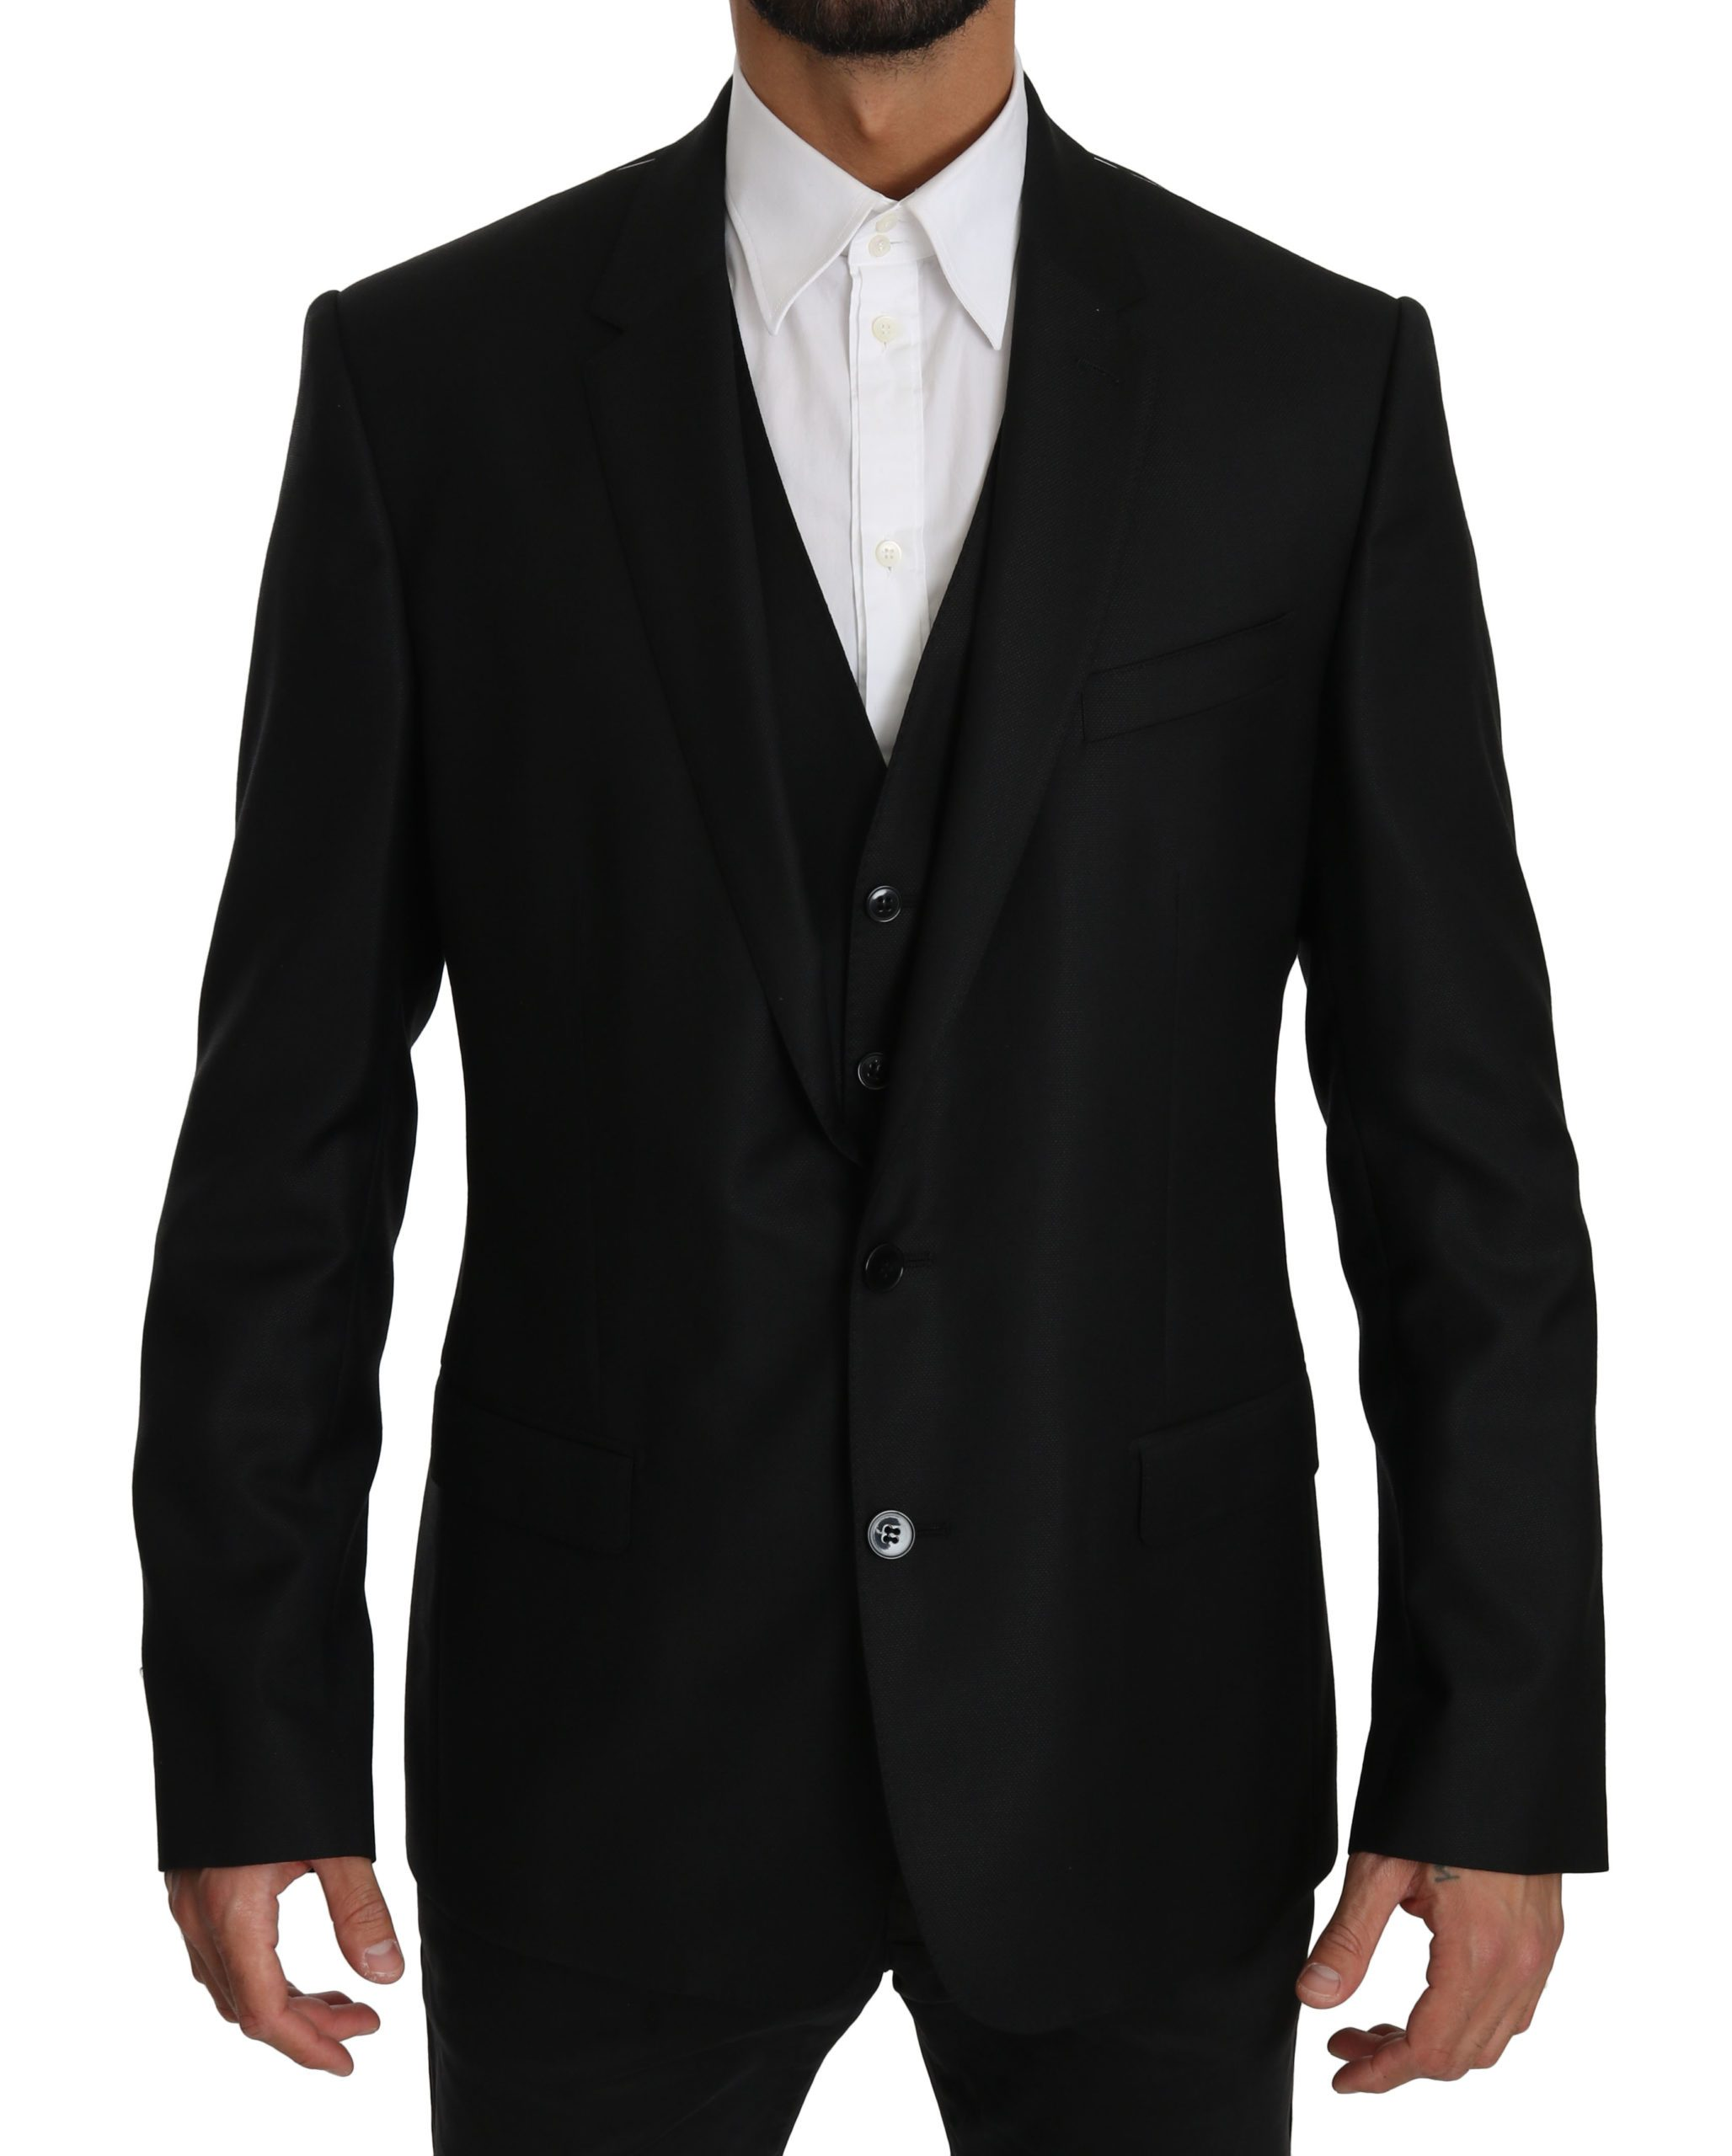 Dolce & Gabbana Men's Two Piece Vest MARTINI Blazer Black KOS1600 - IT52 | XL